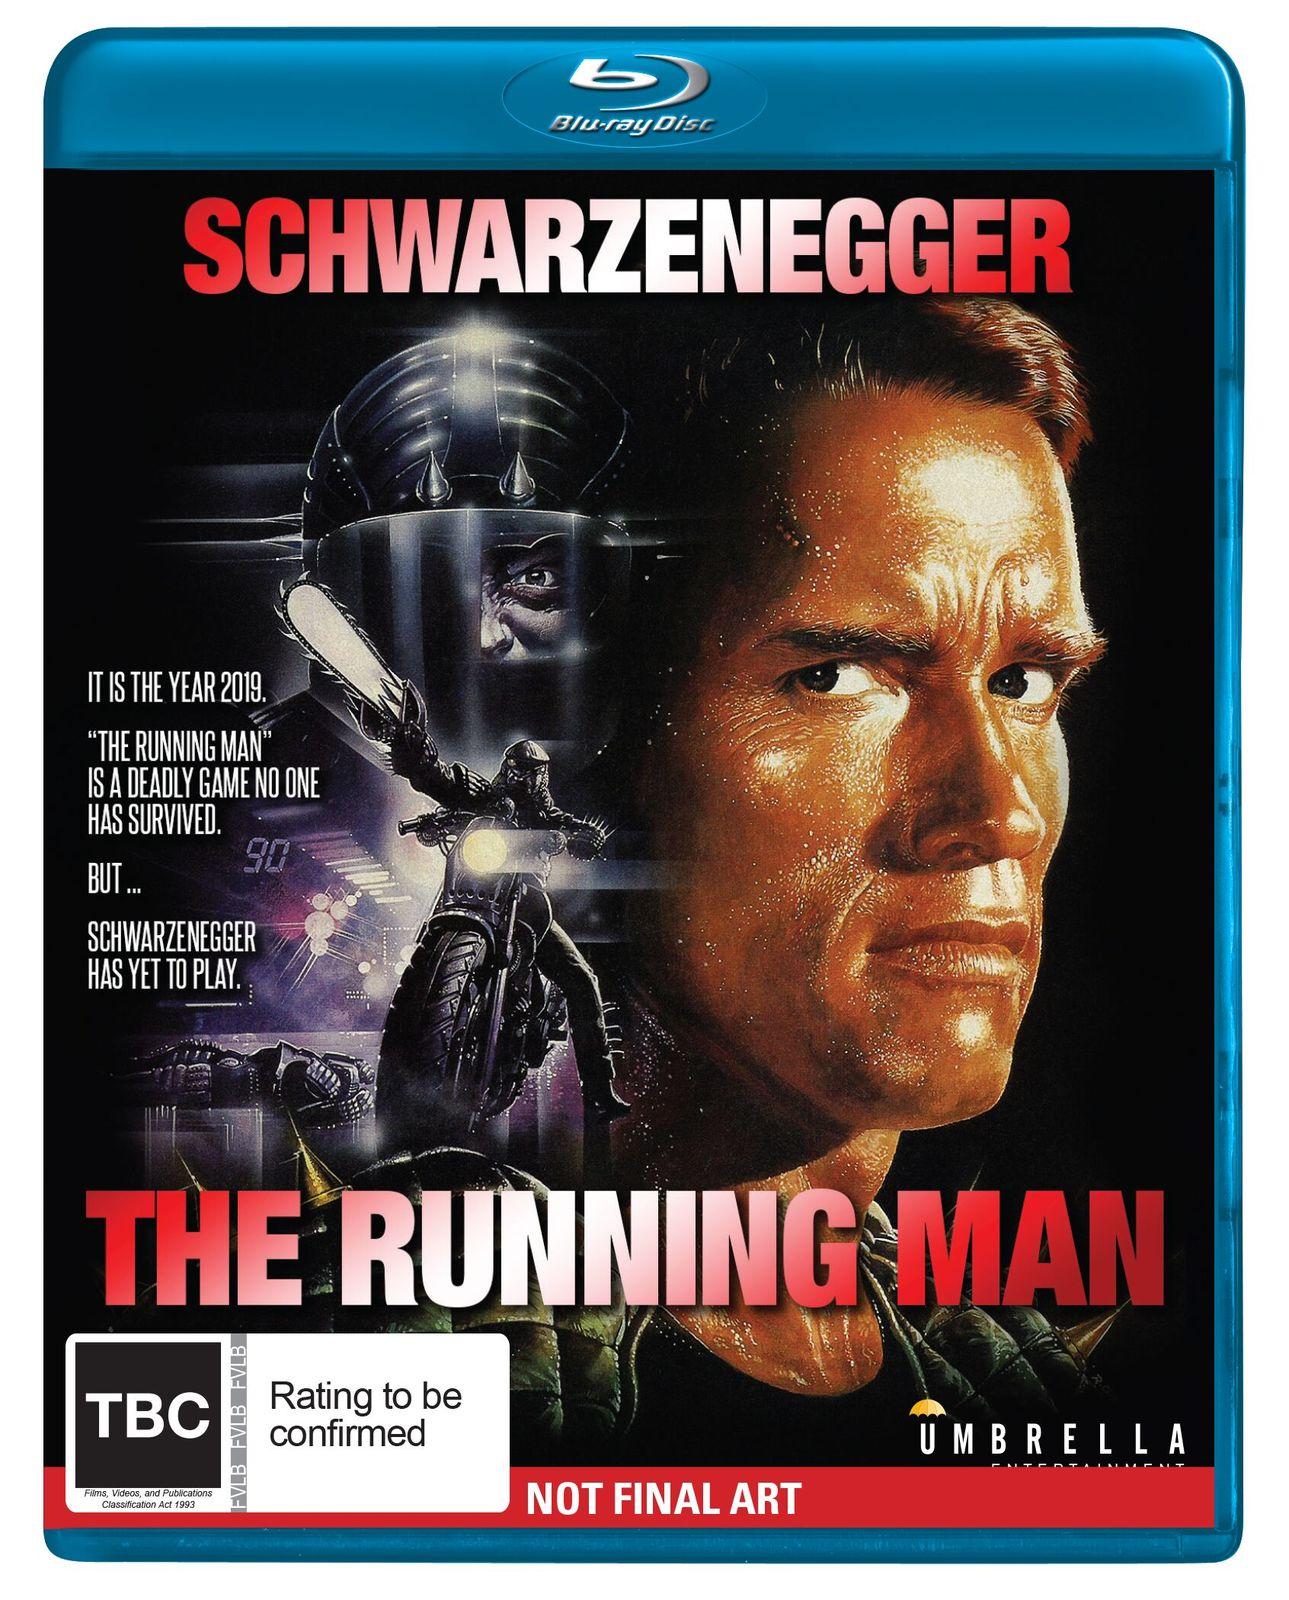 The Running Man on Blu-ray image